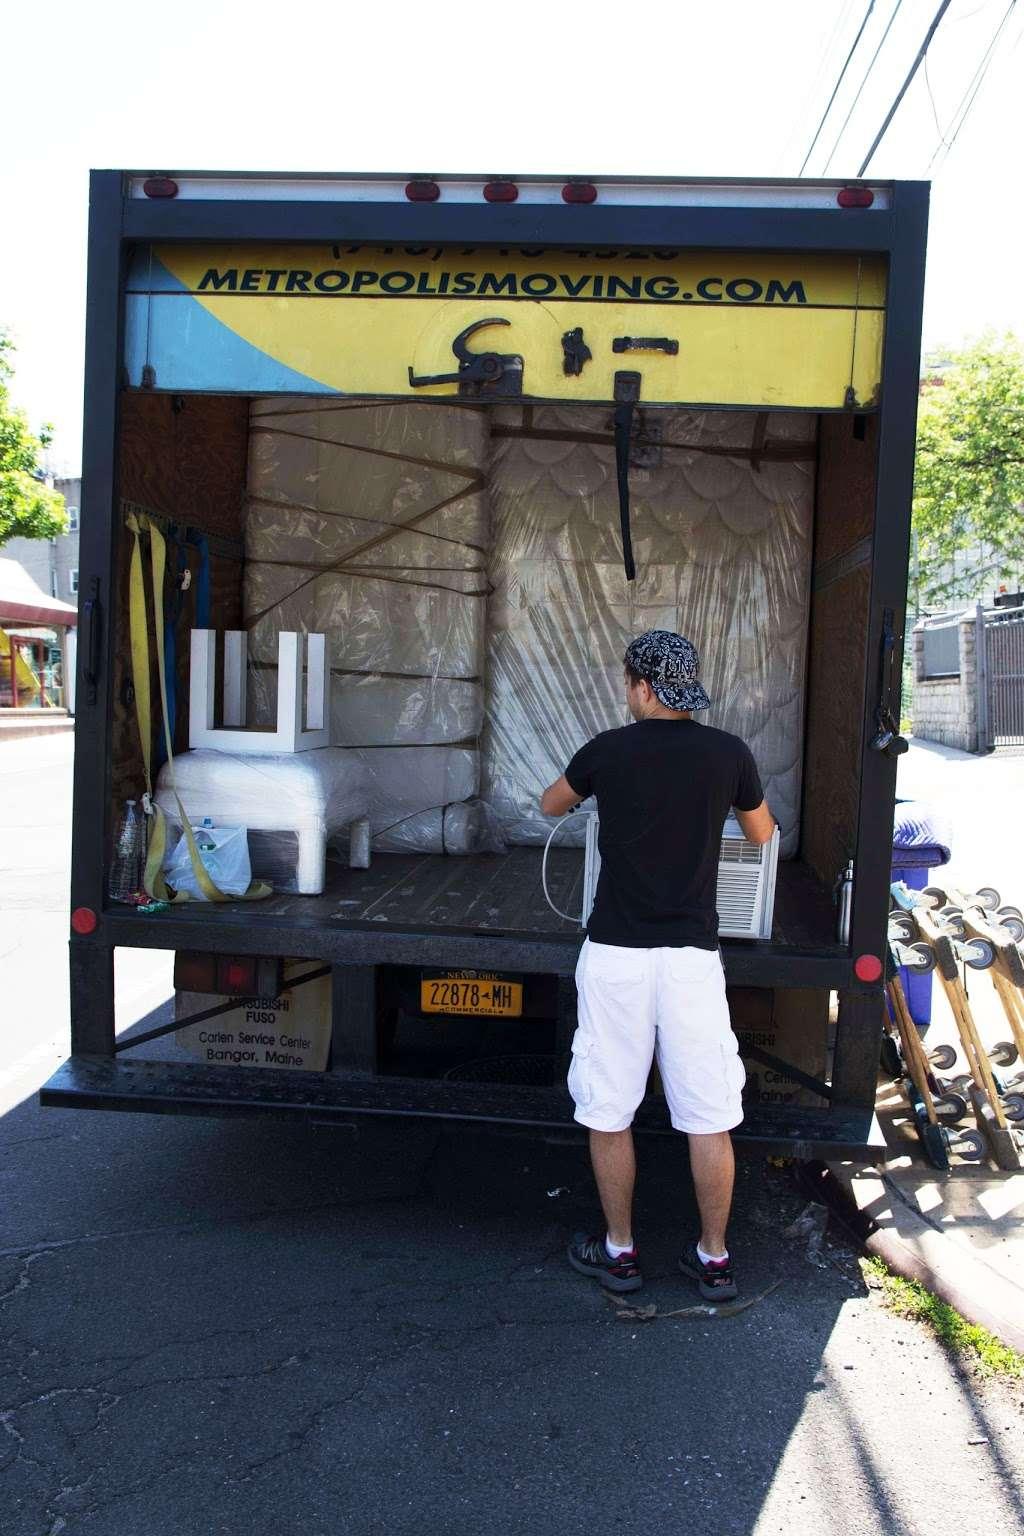 Metropolis Moving - moving company  | Photo 6 of 10 | Address: 476 Jefferson St, Brooklyn, NY 11237, USA | Phone: (718) 710-4520